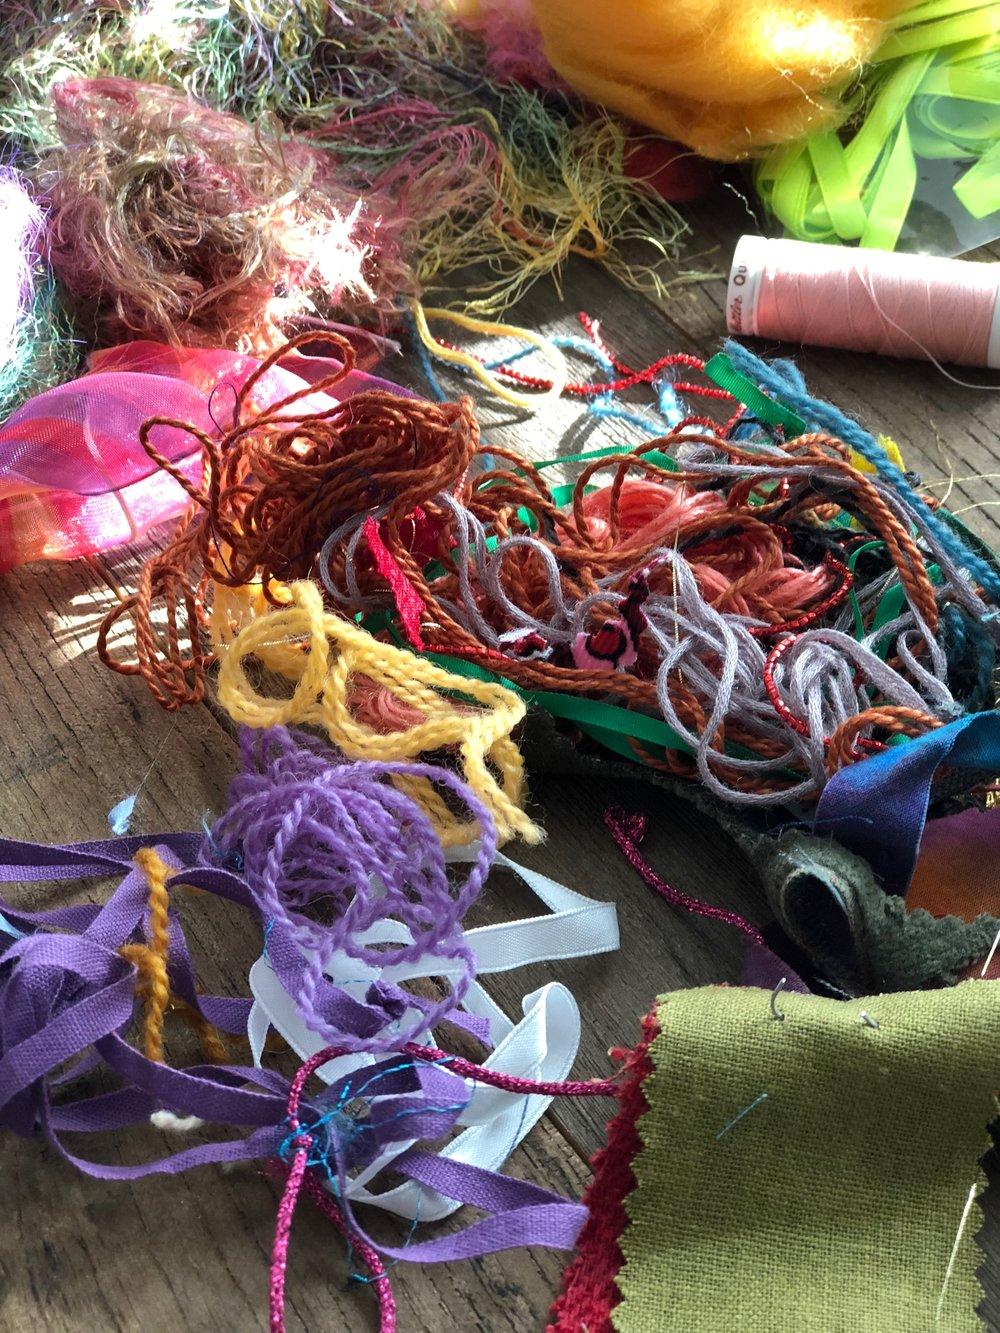 Assorted embellishment yarns and fibers